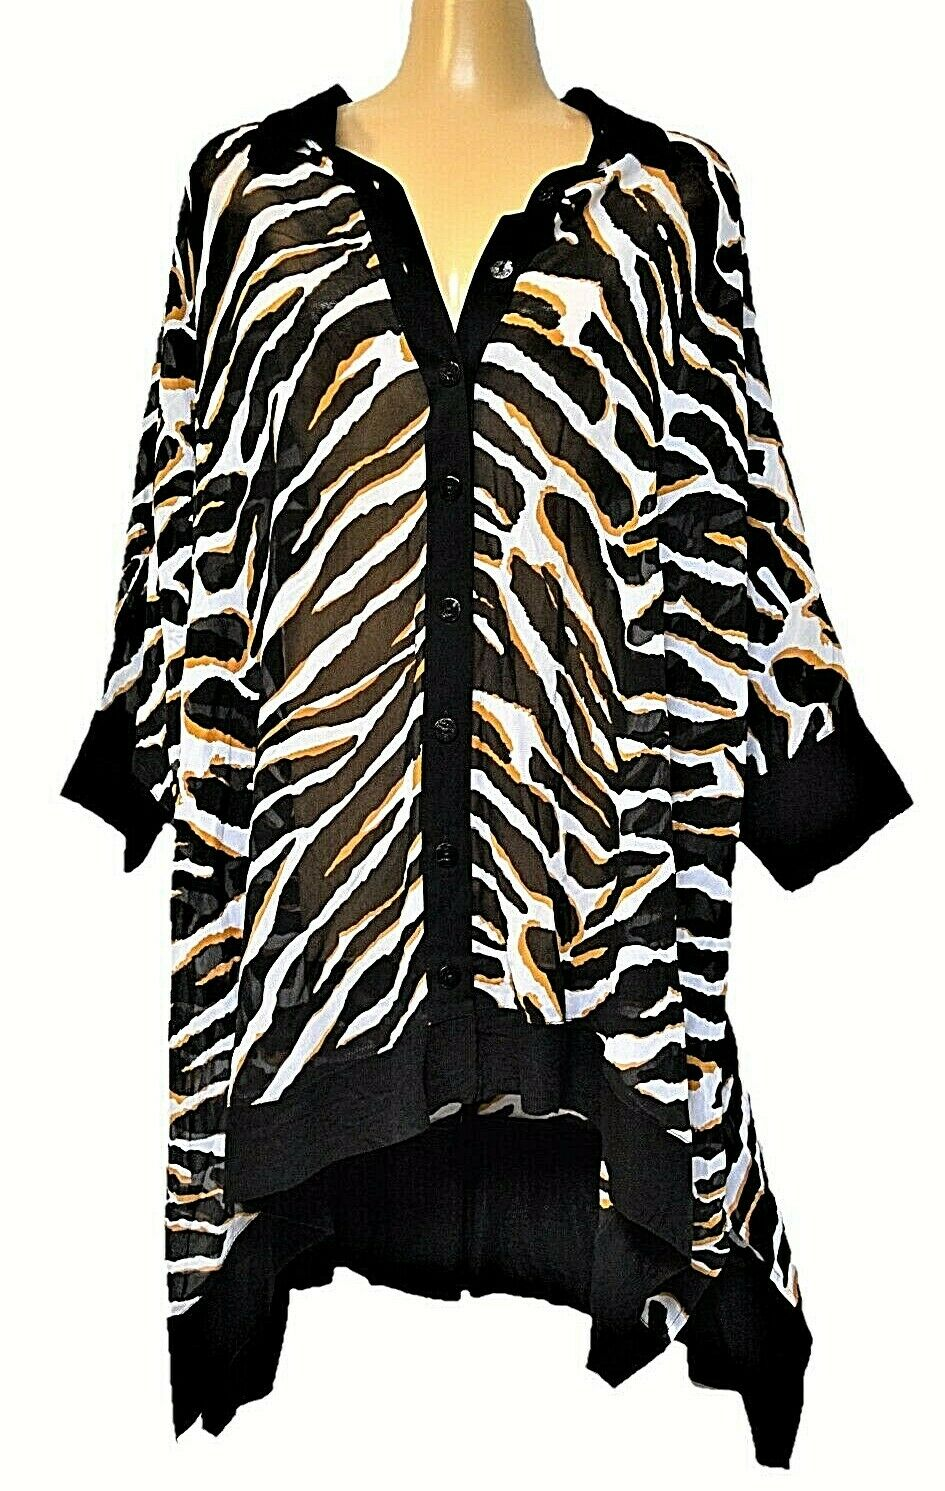 TS top TAKING SHAPE OSFA plus Größe Animal Instinct Shirt semi-sheer NWT rrp